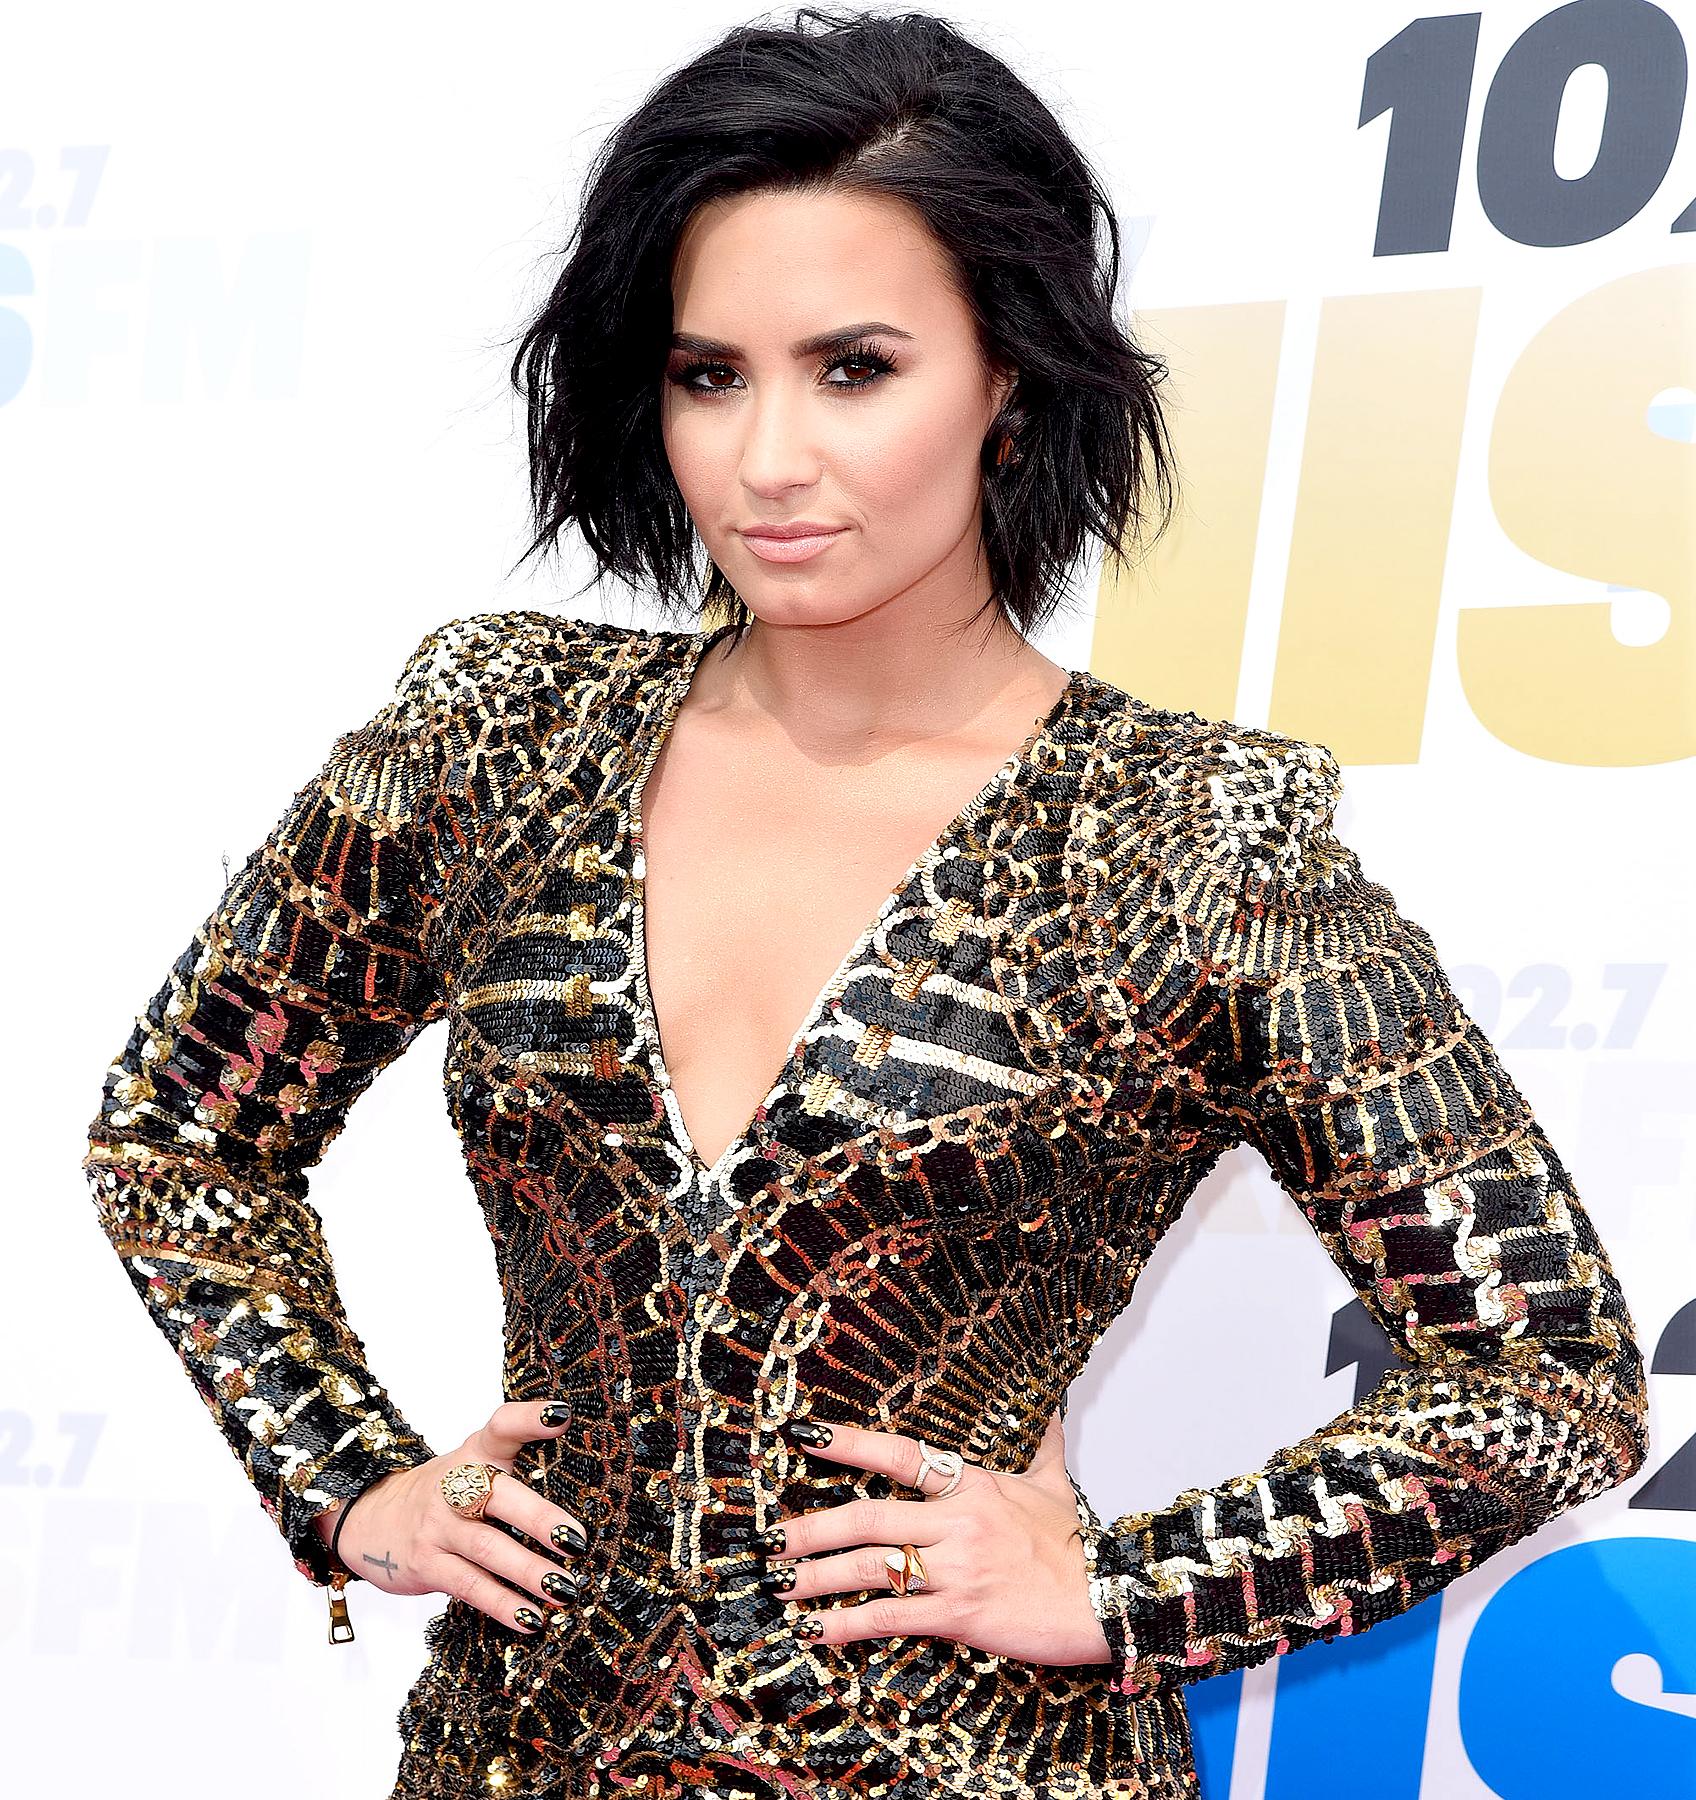 Demi Lovato attends 102.7 KIIS FM's Wango Tango 2016.